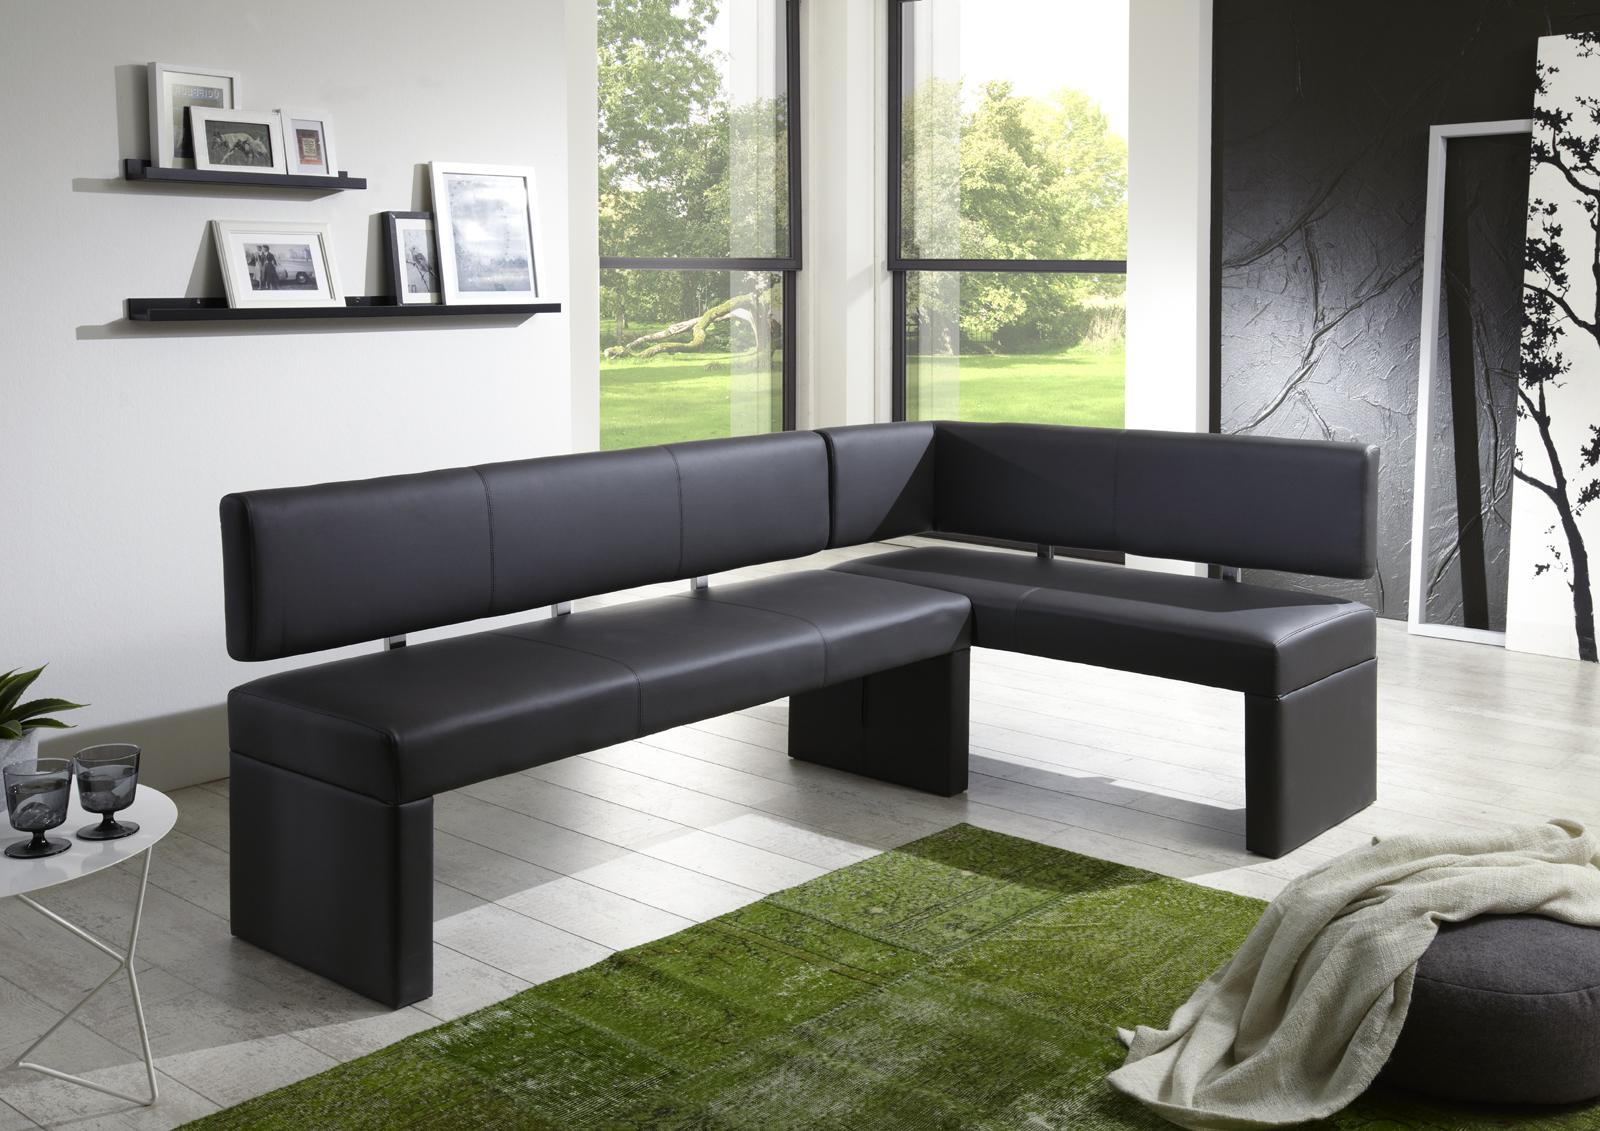 sam esszimmer eckbank hellgrau wunsch x 170 cm lasilas. Black Bedroom Furniture Sets. Home Design Ideas